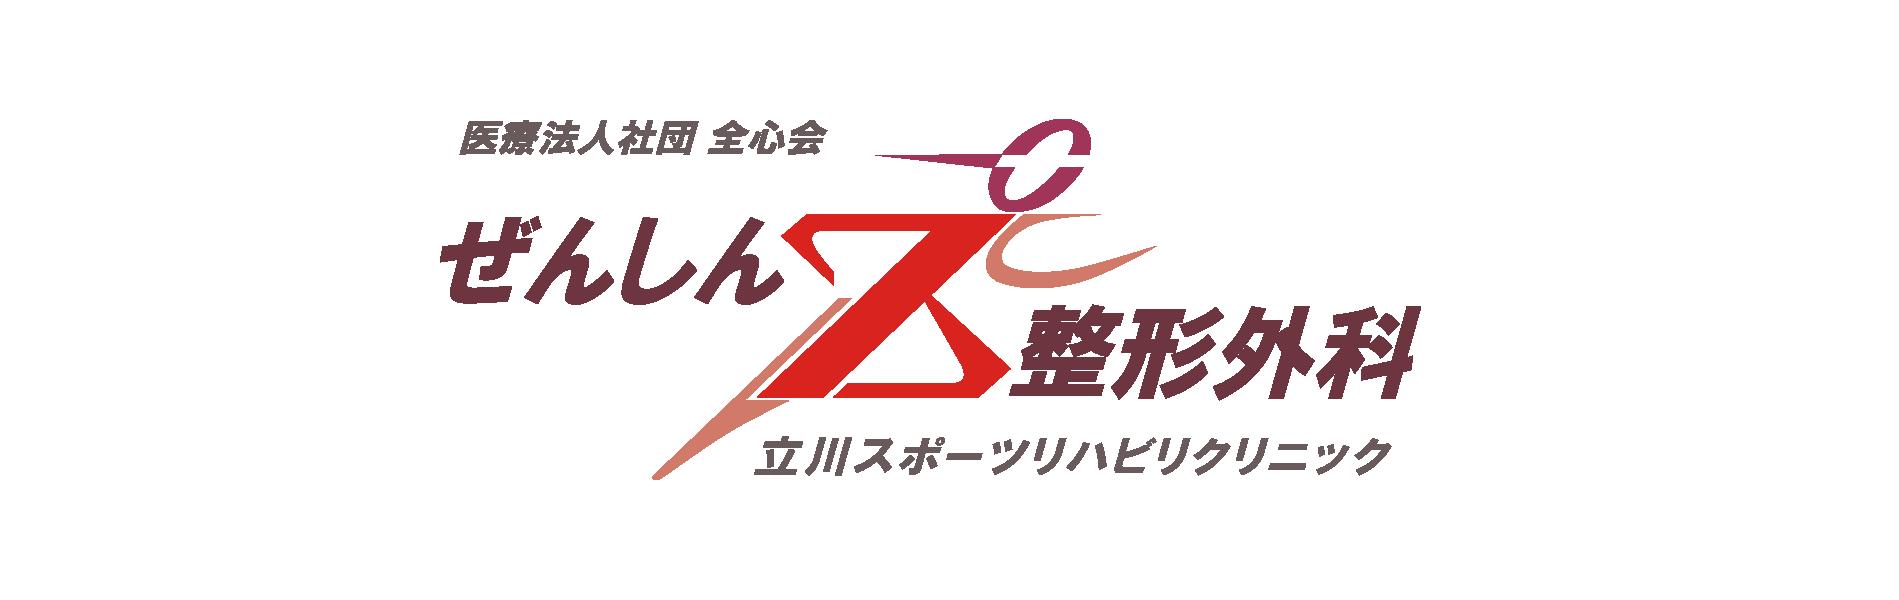 logo1900